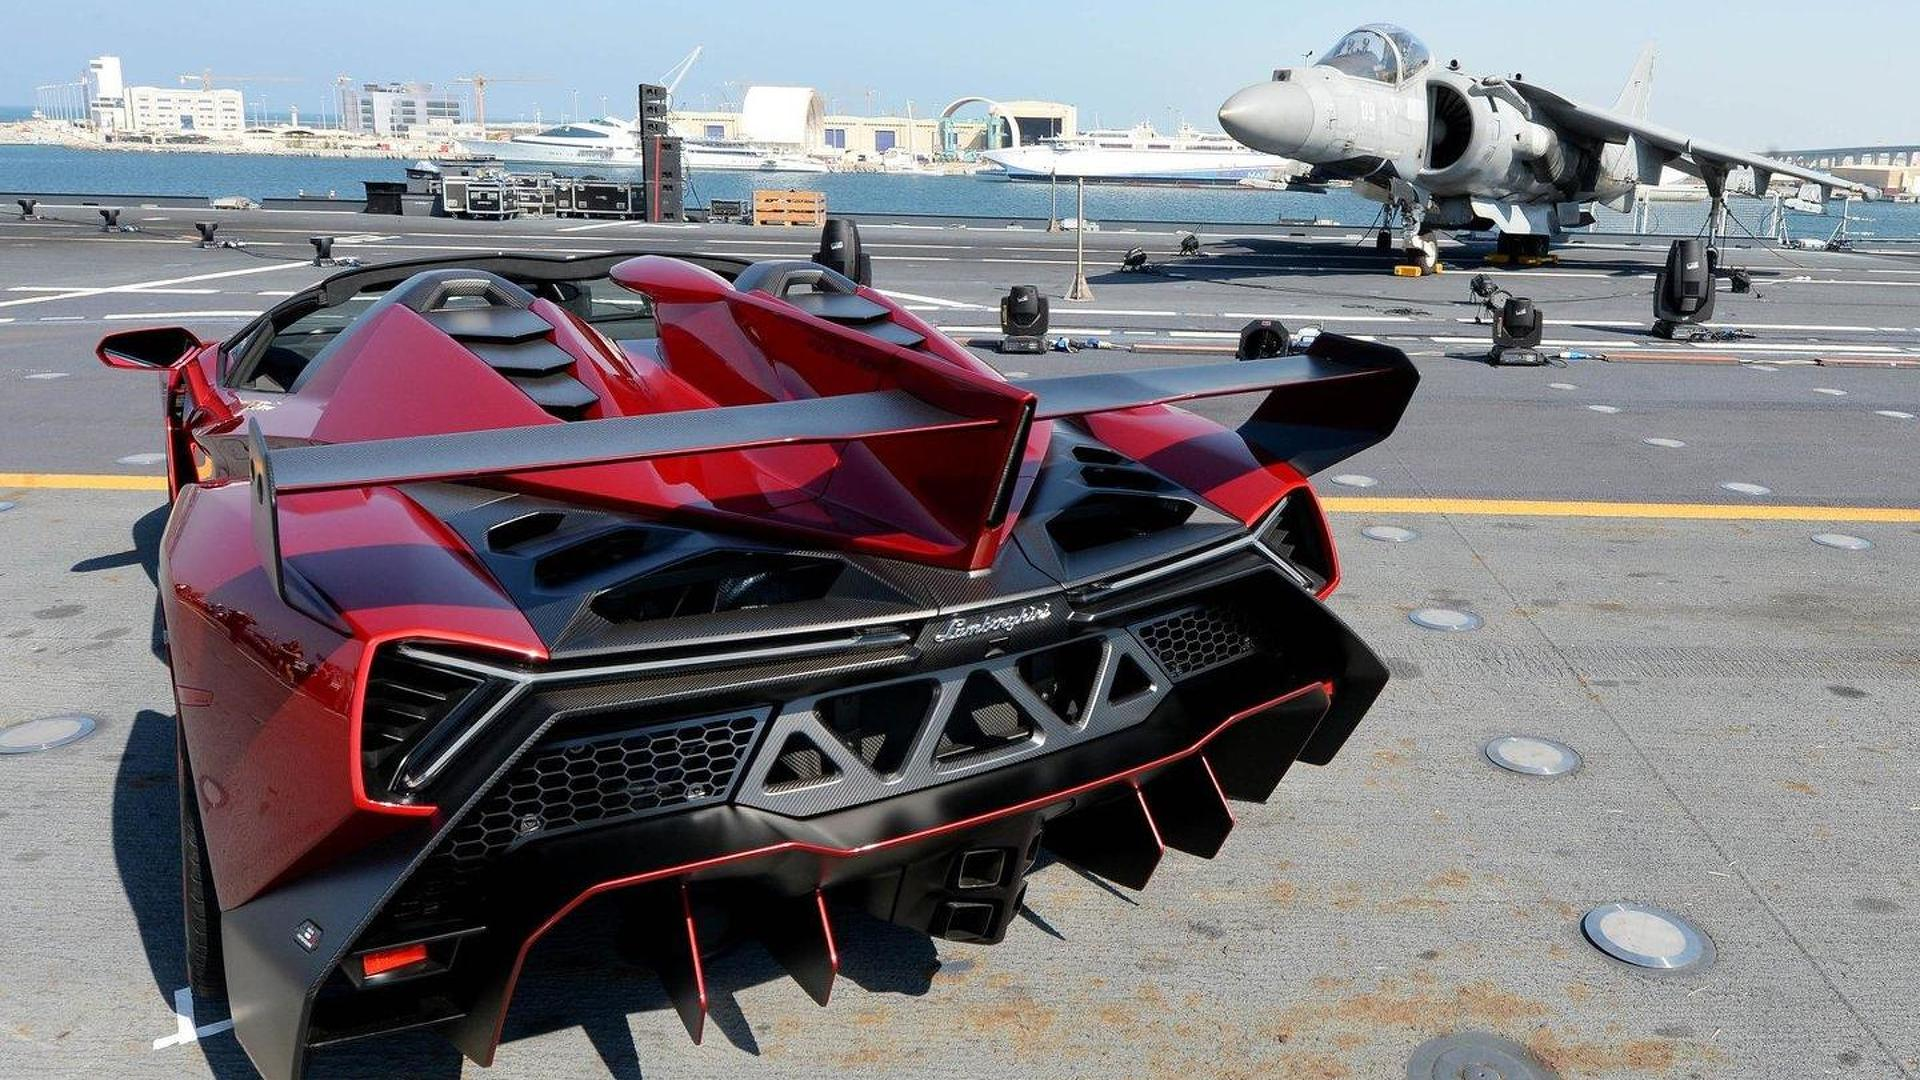 Lamborghini Veneno Roadster presented on aircraft carrier in UAE